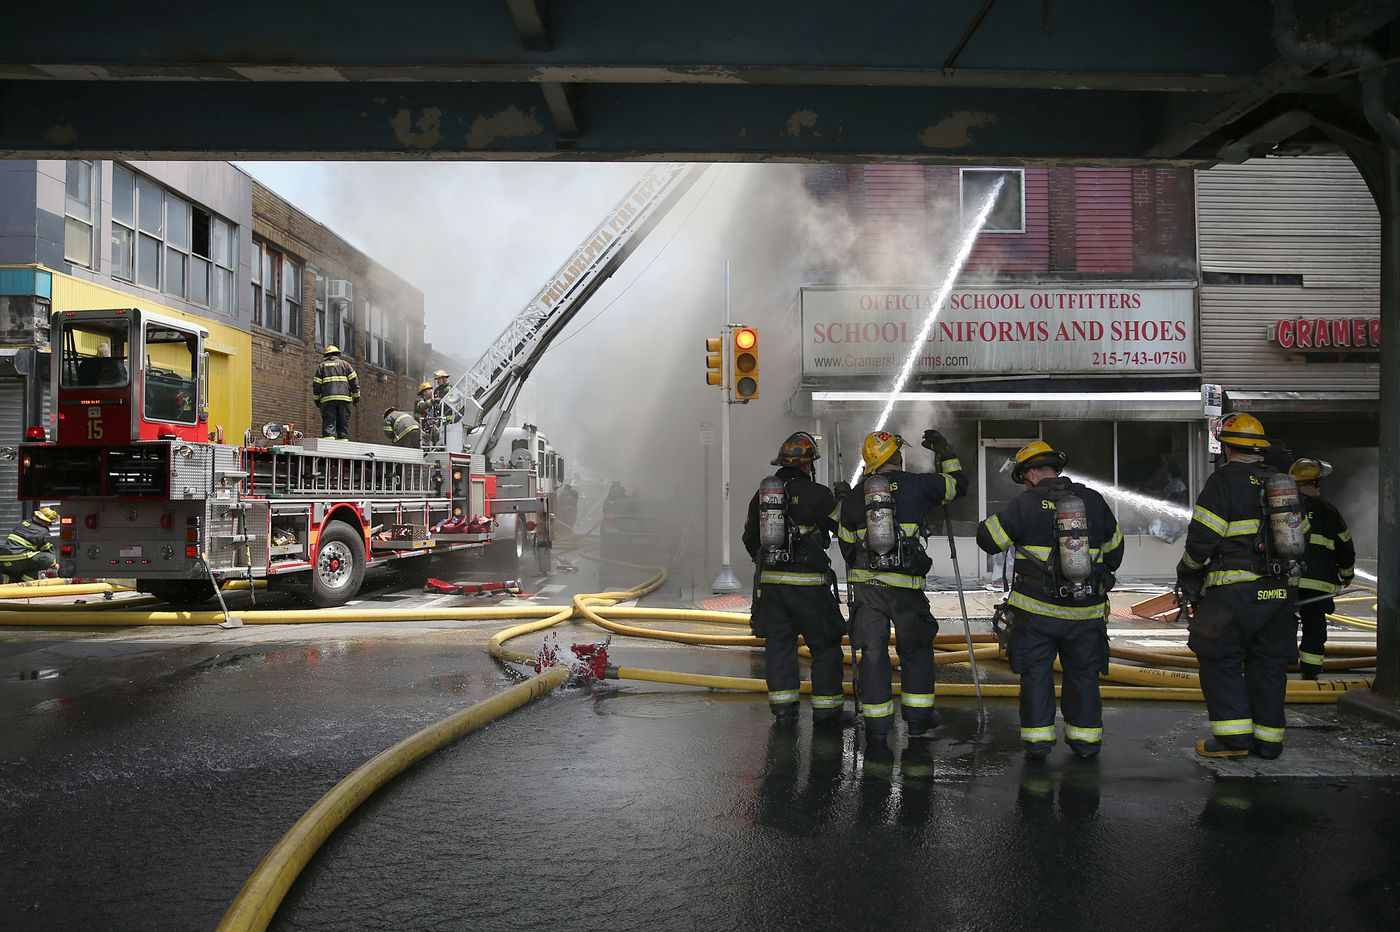 4-alarm fire destroys Philly school uniform store